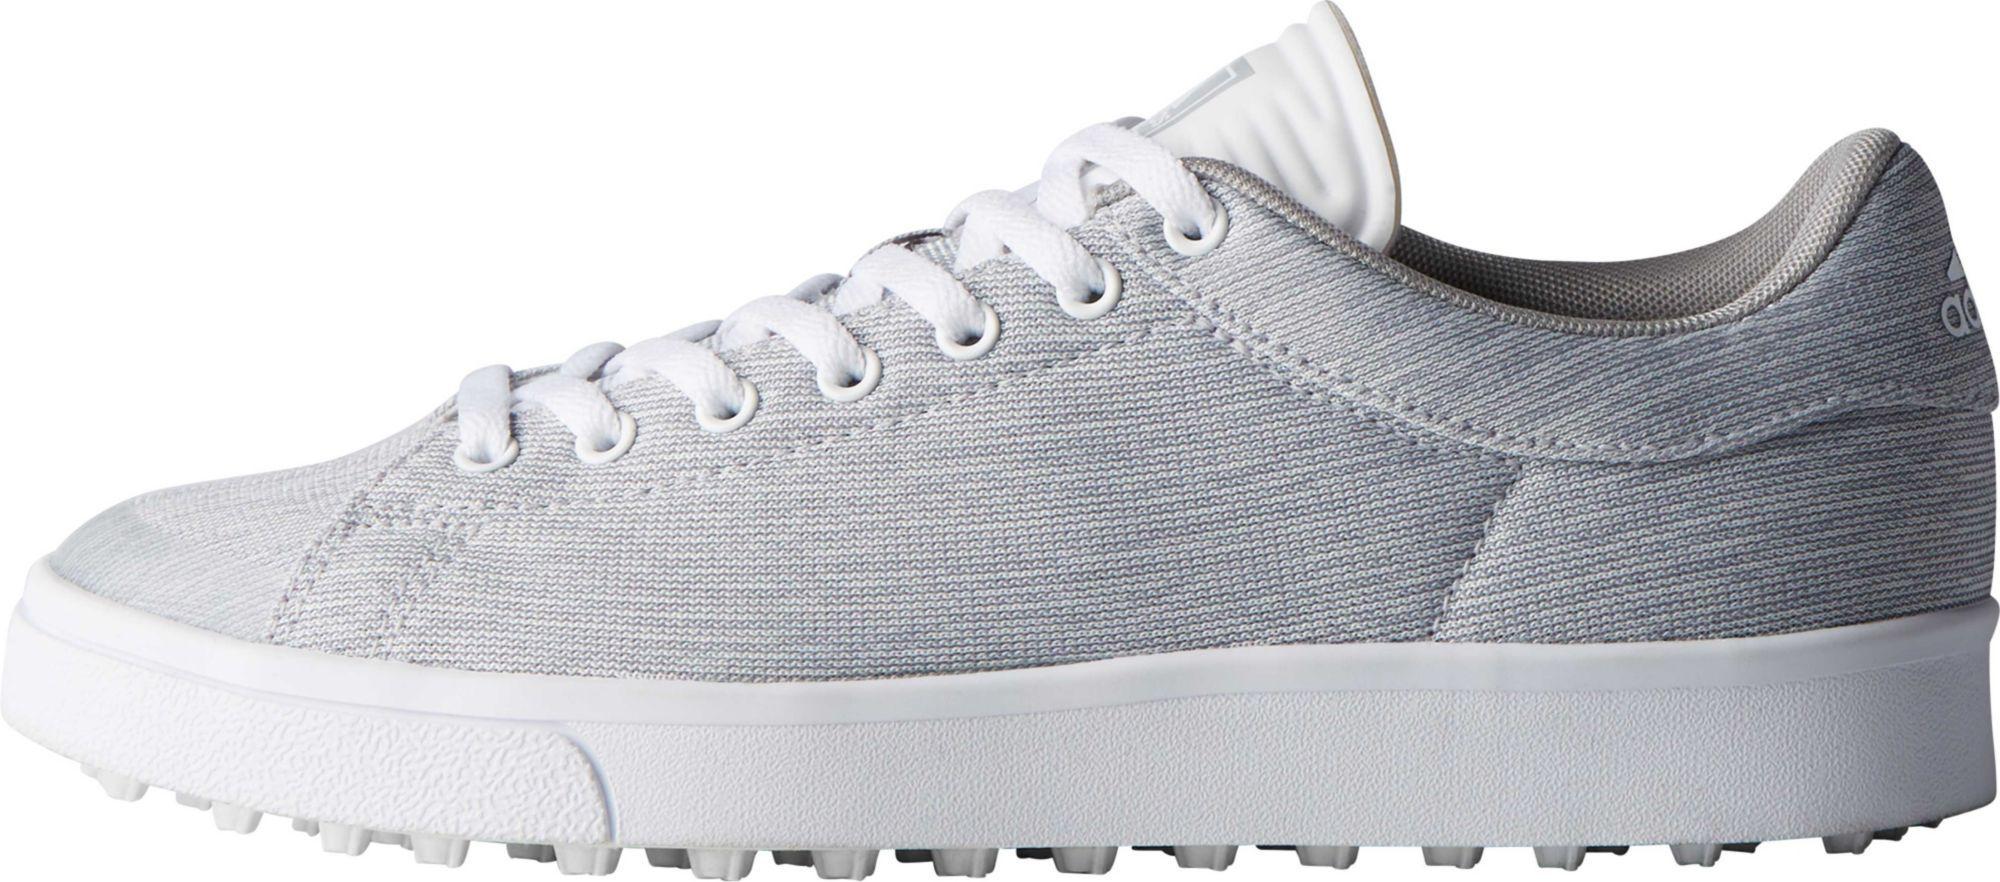 reputable site 57ac7 3c1b1 adidas Jr. adicross Classic Golf Shoes, Size 5.0, Gray